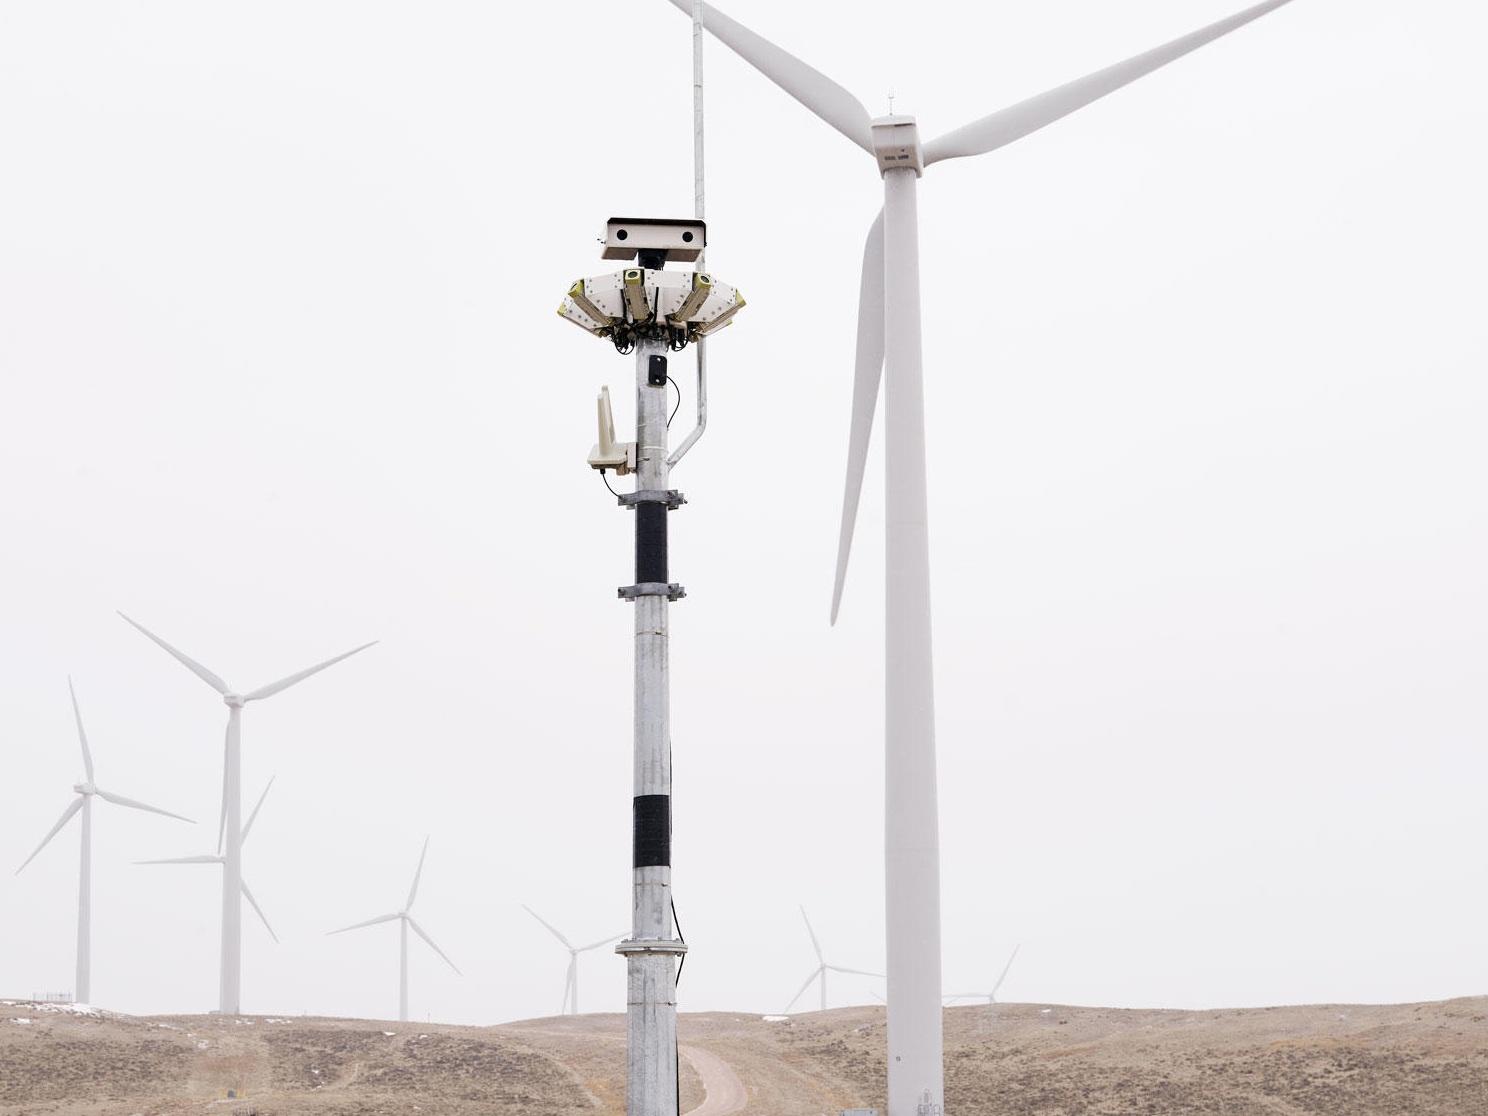 How+New+Technology+Is+Making+Wind+Farms+Safer+for+Birds+_+Audubon.jpg